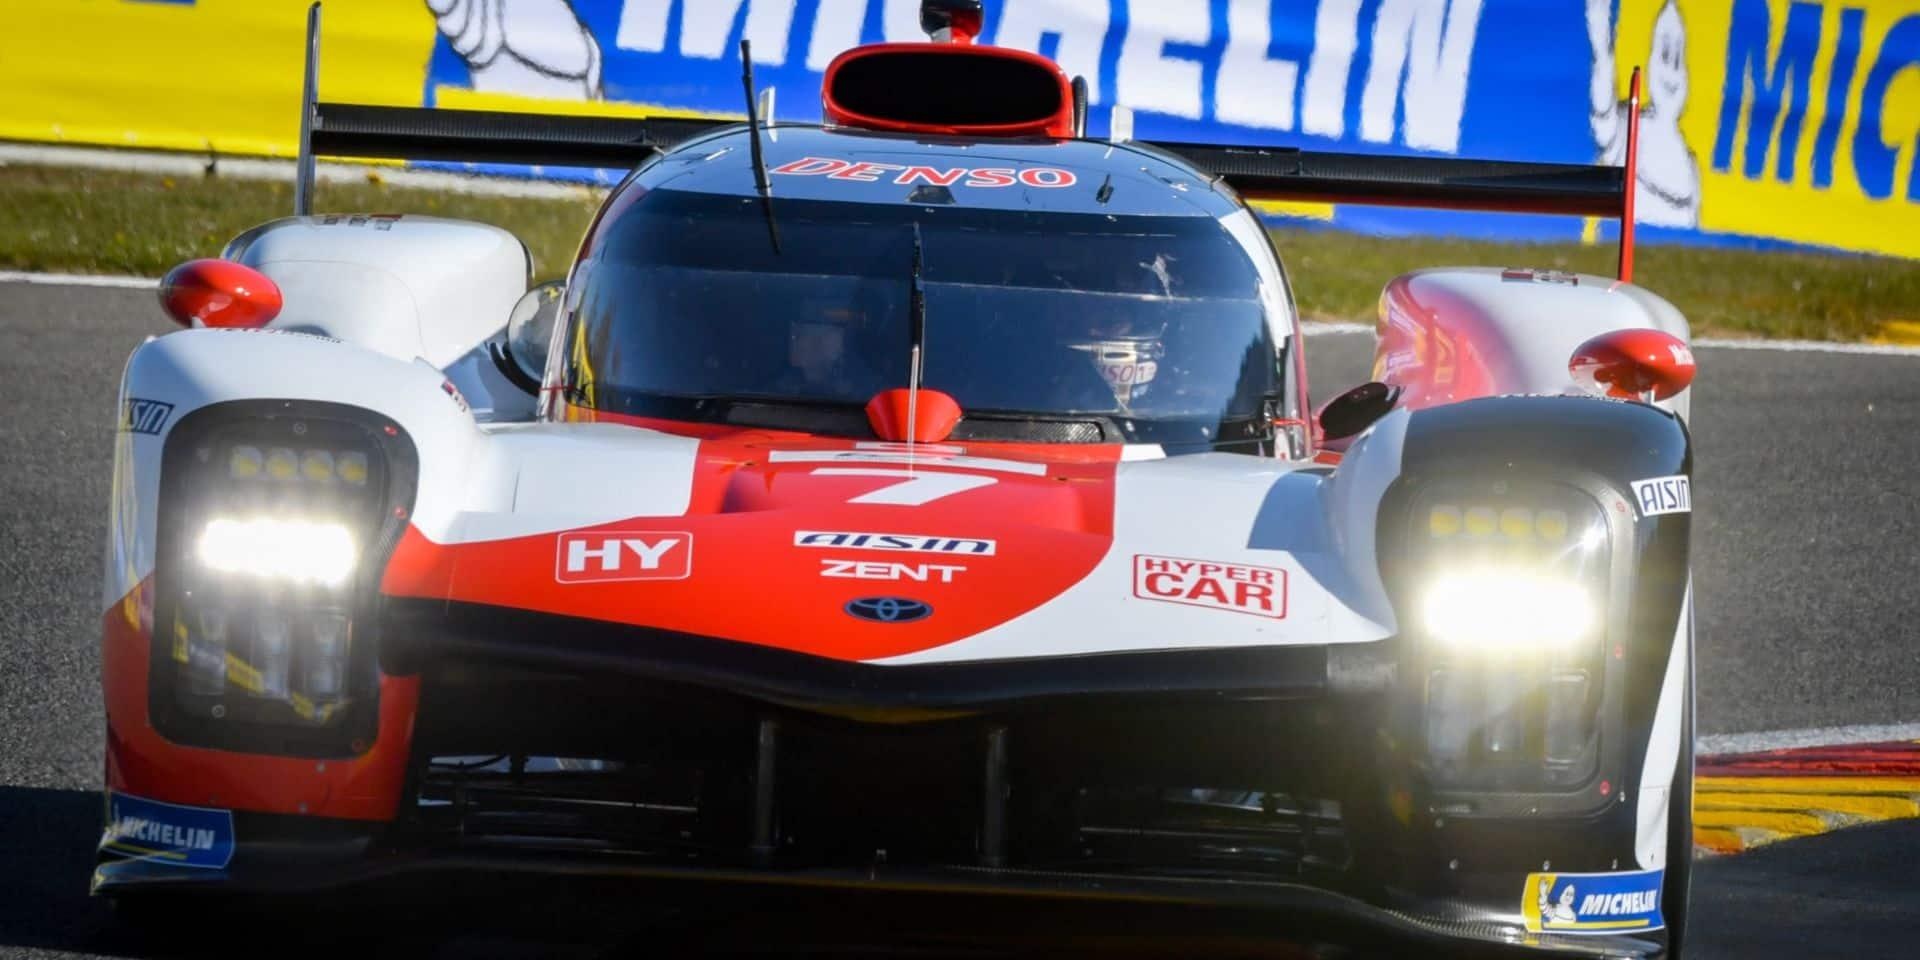 WEC 6H de Spa: Kamui Kobayashi signe la première pole d'une Toyota Hypercar